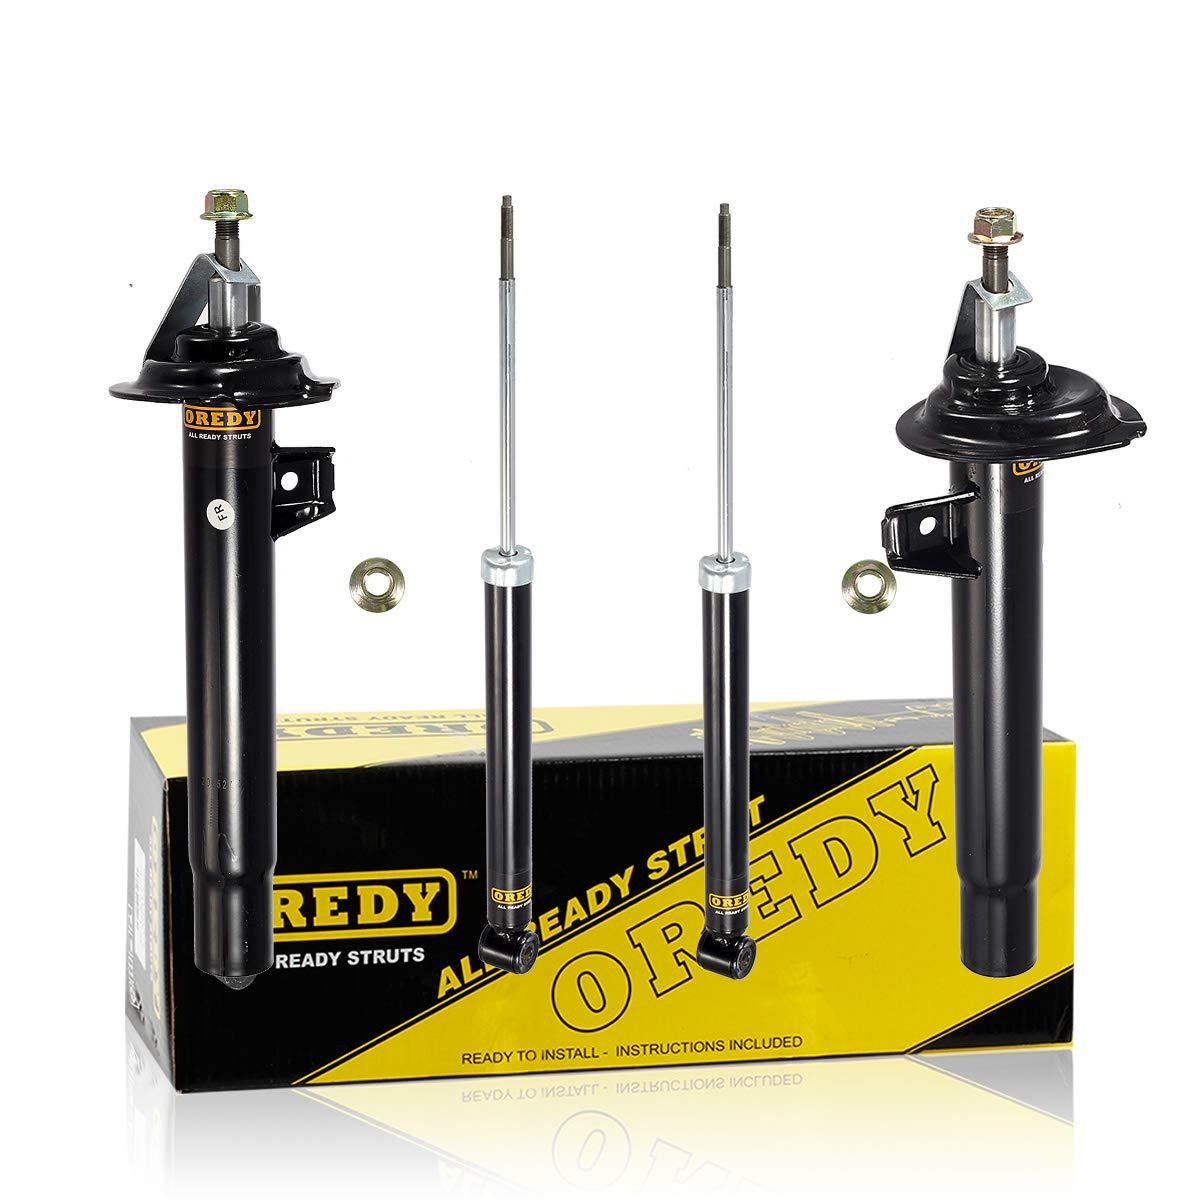 OREDY Full Set 4Pcs Complete Shocks Struts Coil Spring Assembly Kit Compatible with Honda Accord 2008 2009 2010 2011 2012#172563 15180 SR4174 SR1473